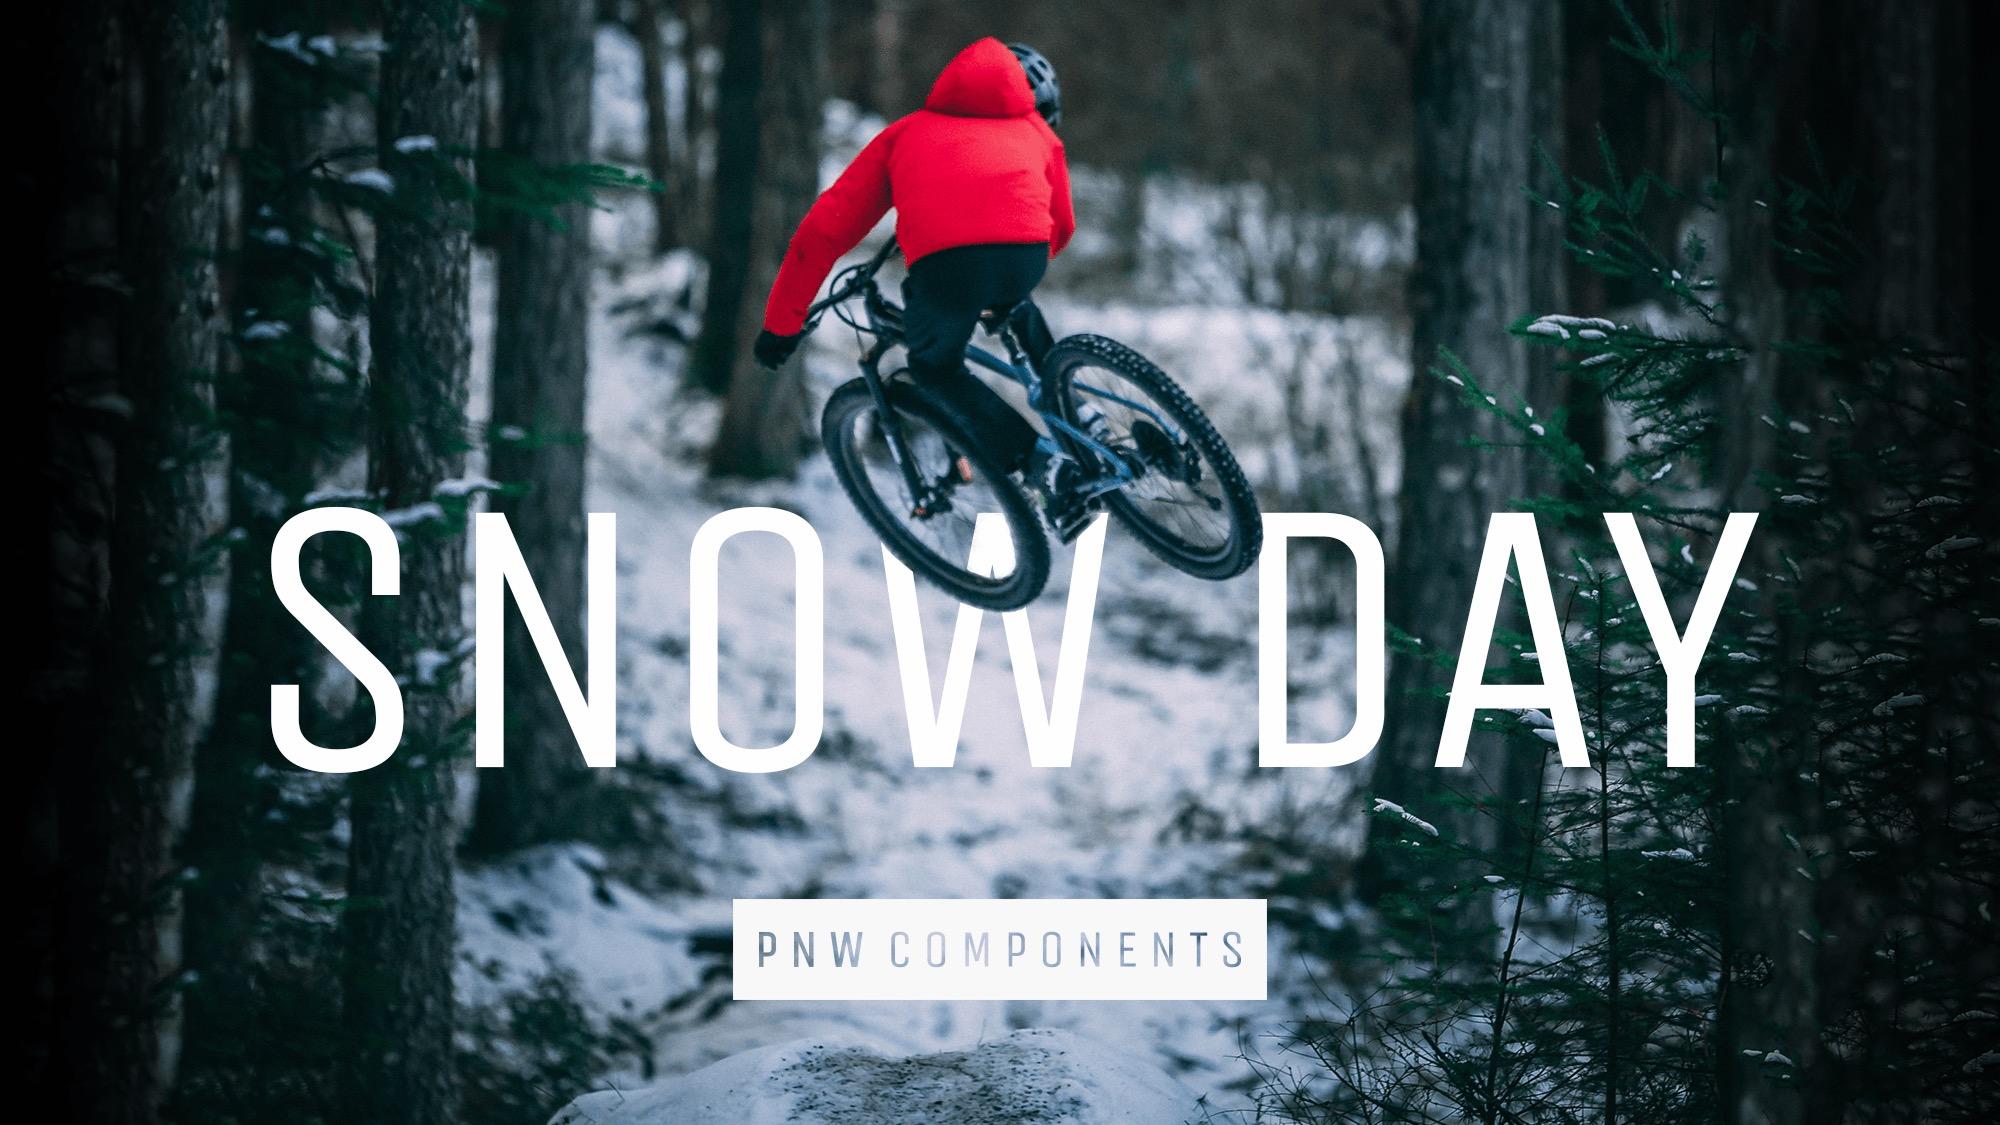 Mark Matthews Shreds a Snow Day